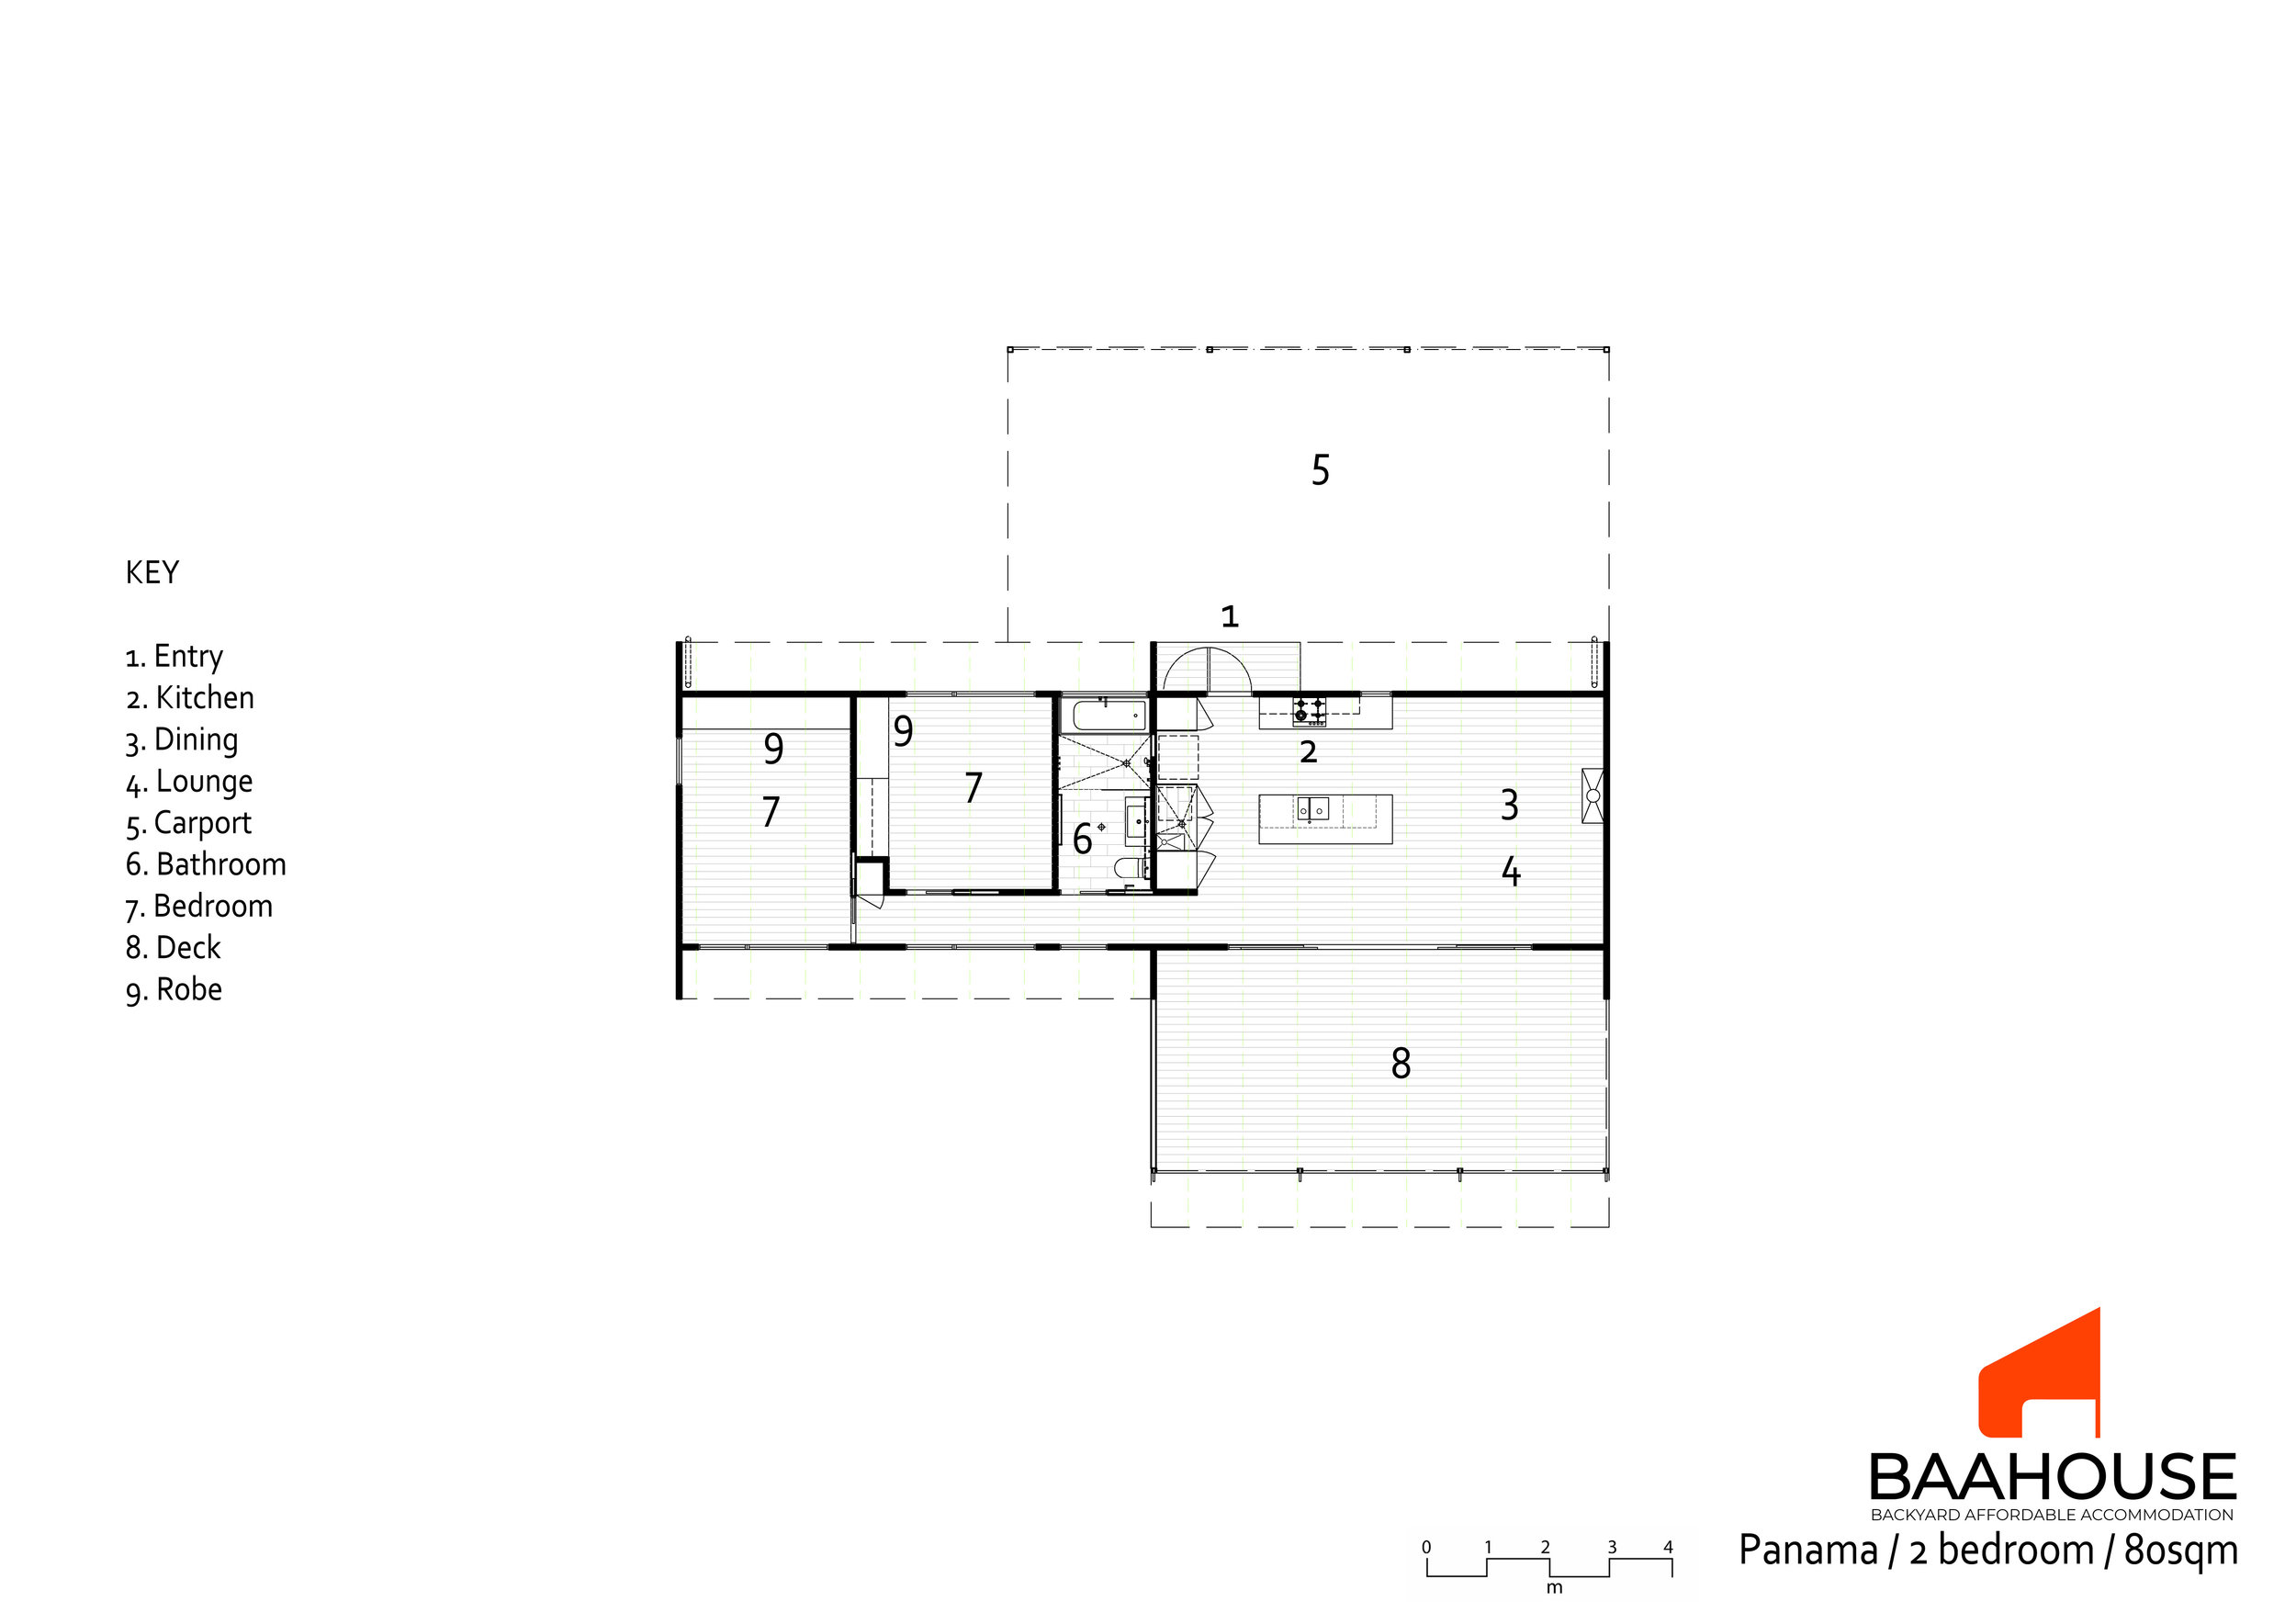 Panama Long House floor plan